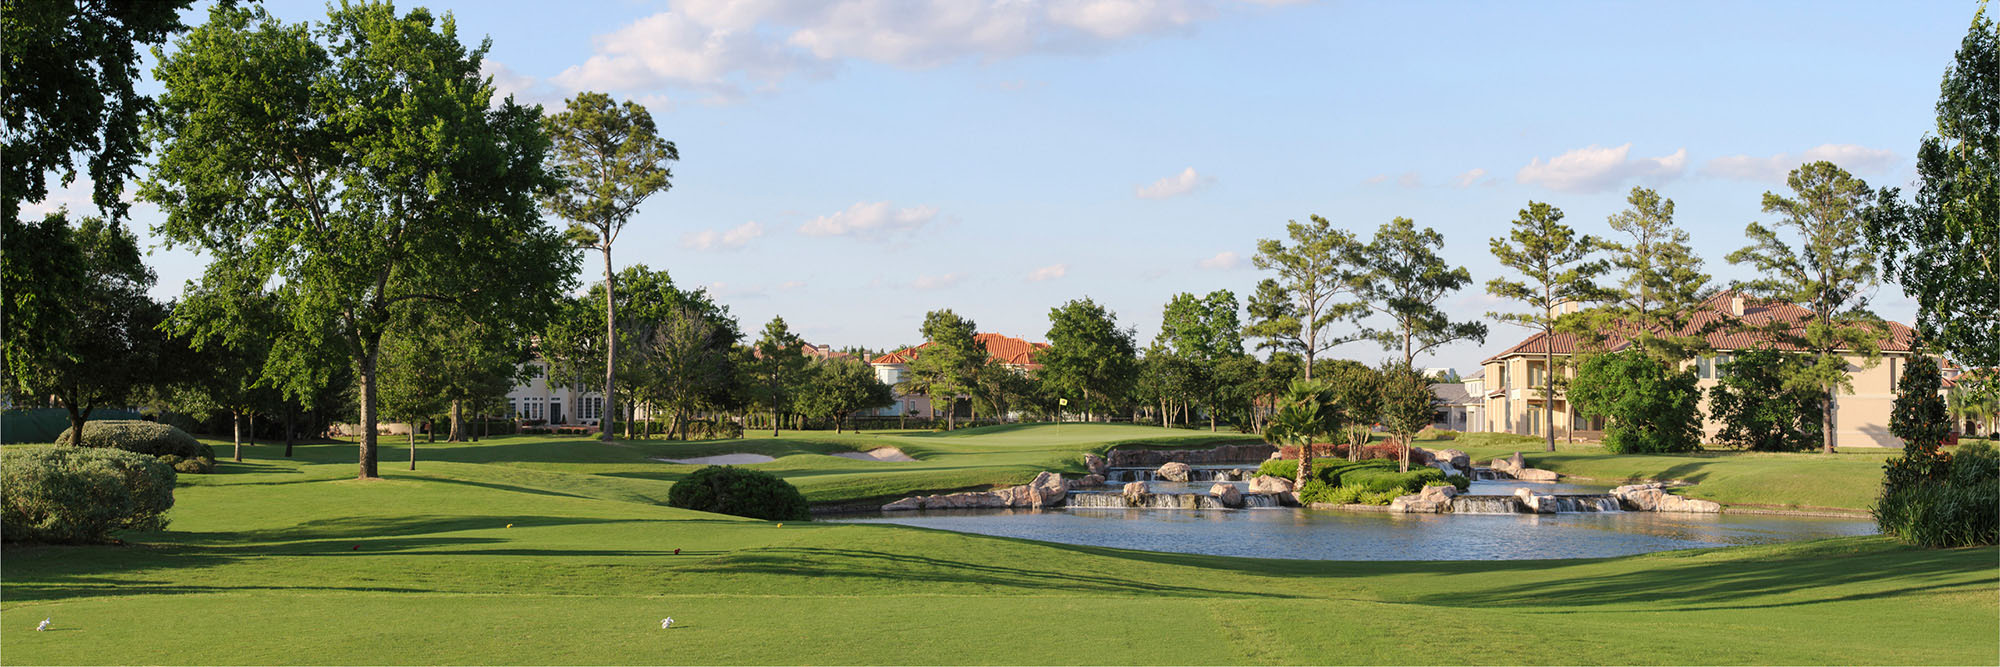 Golf Course Image - Royal Oaks No. 16